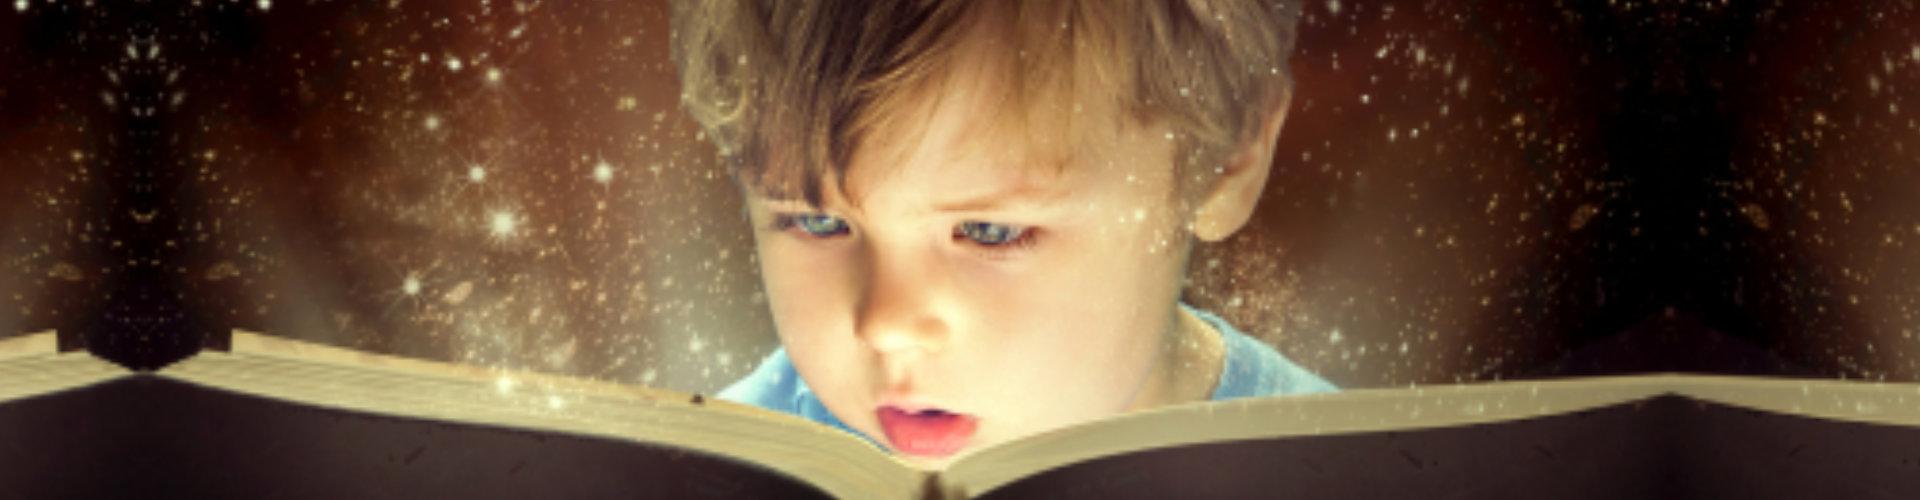 little kid reading a book